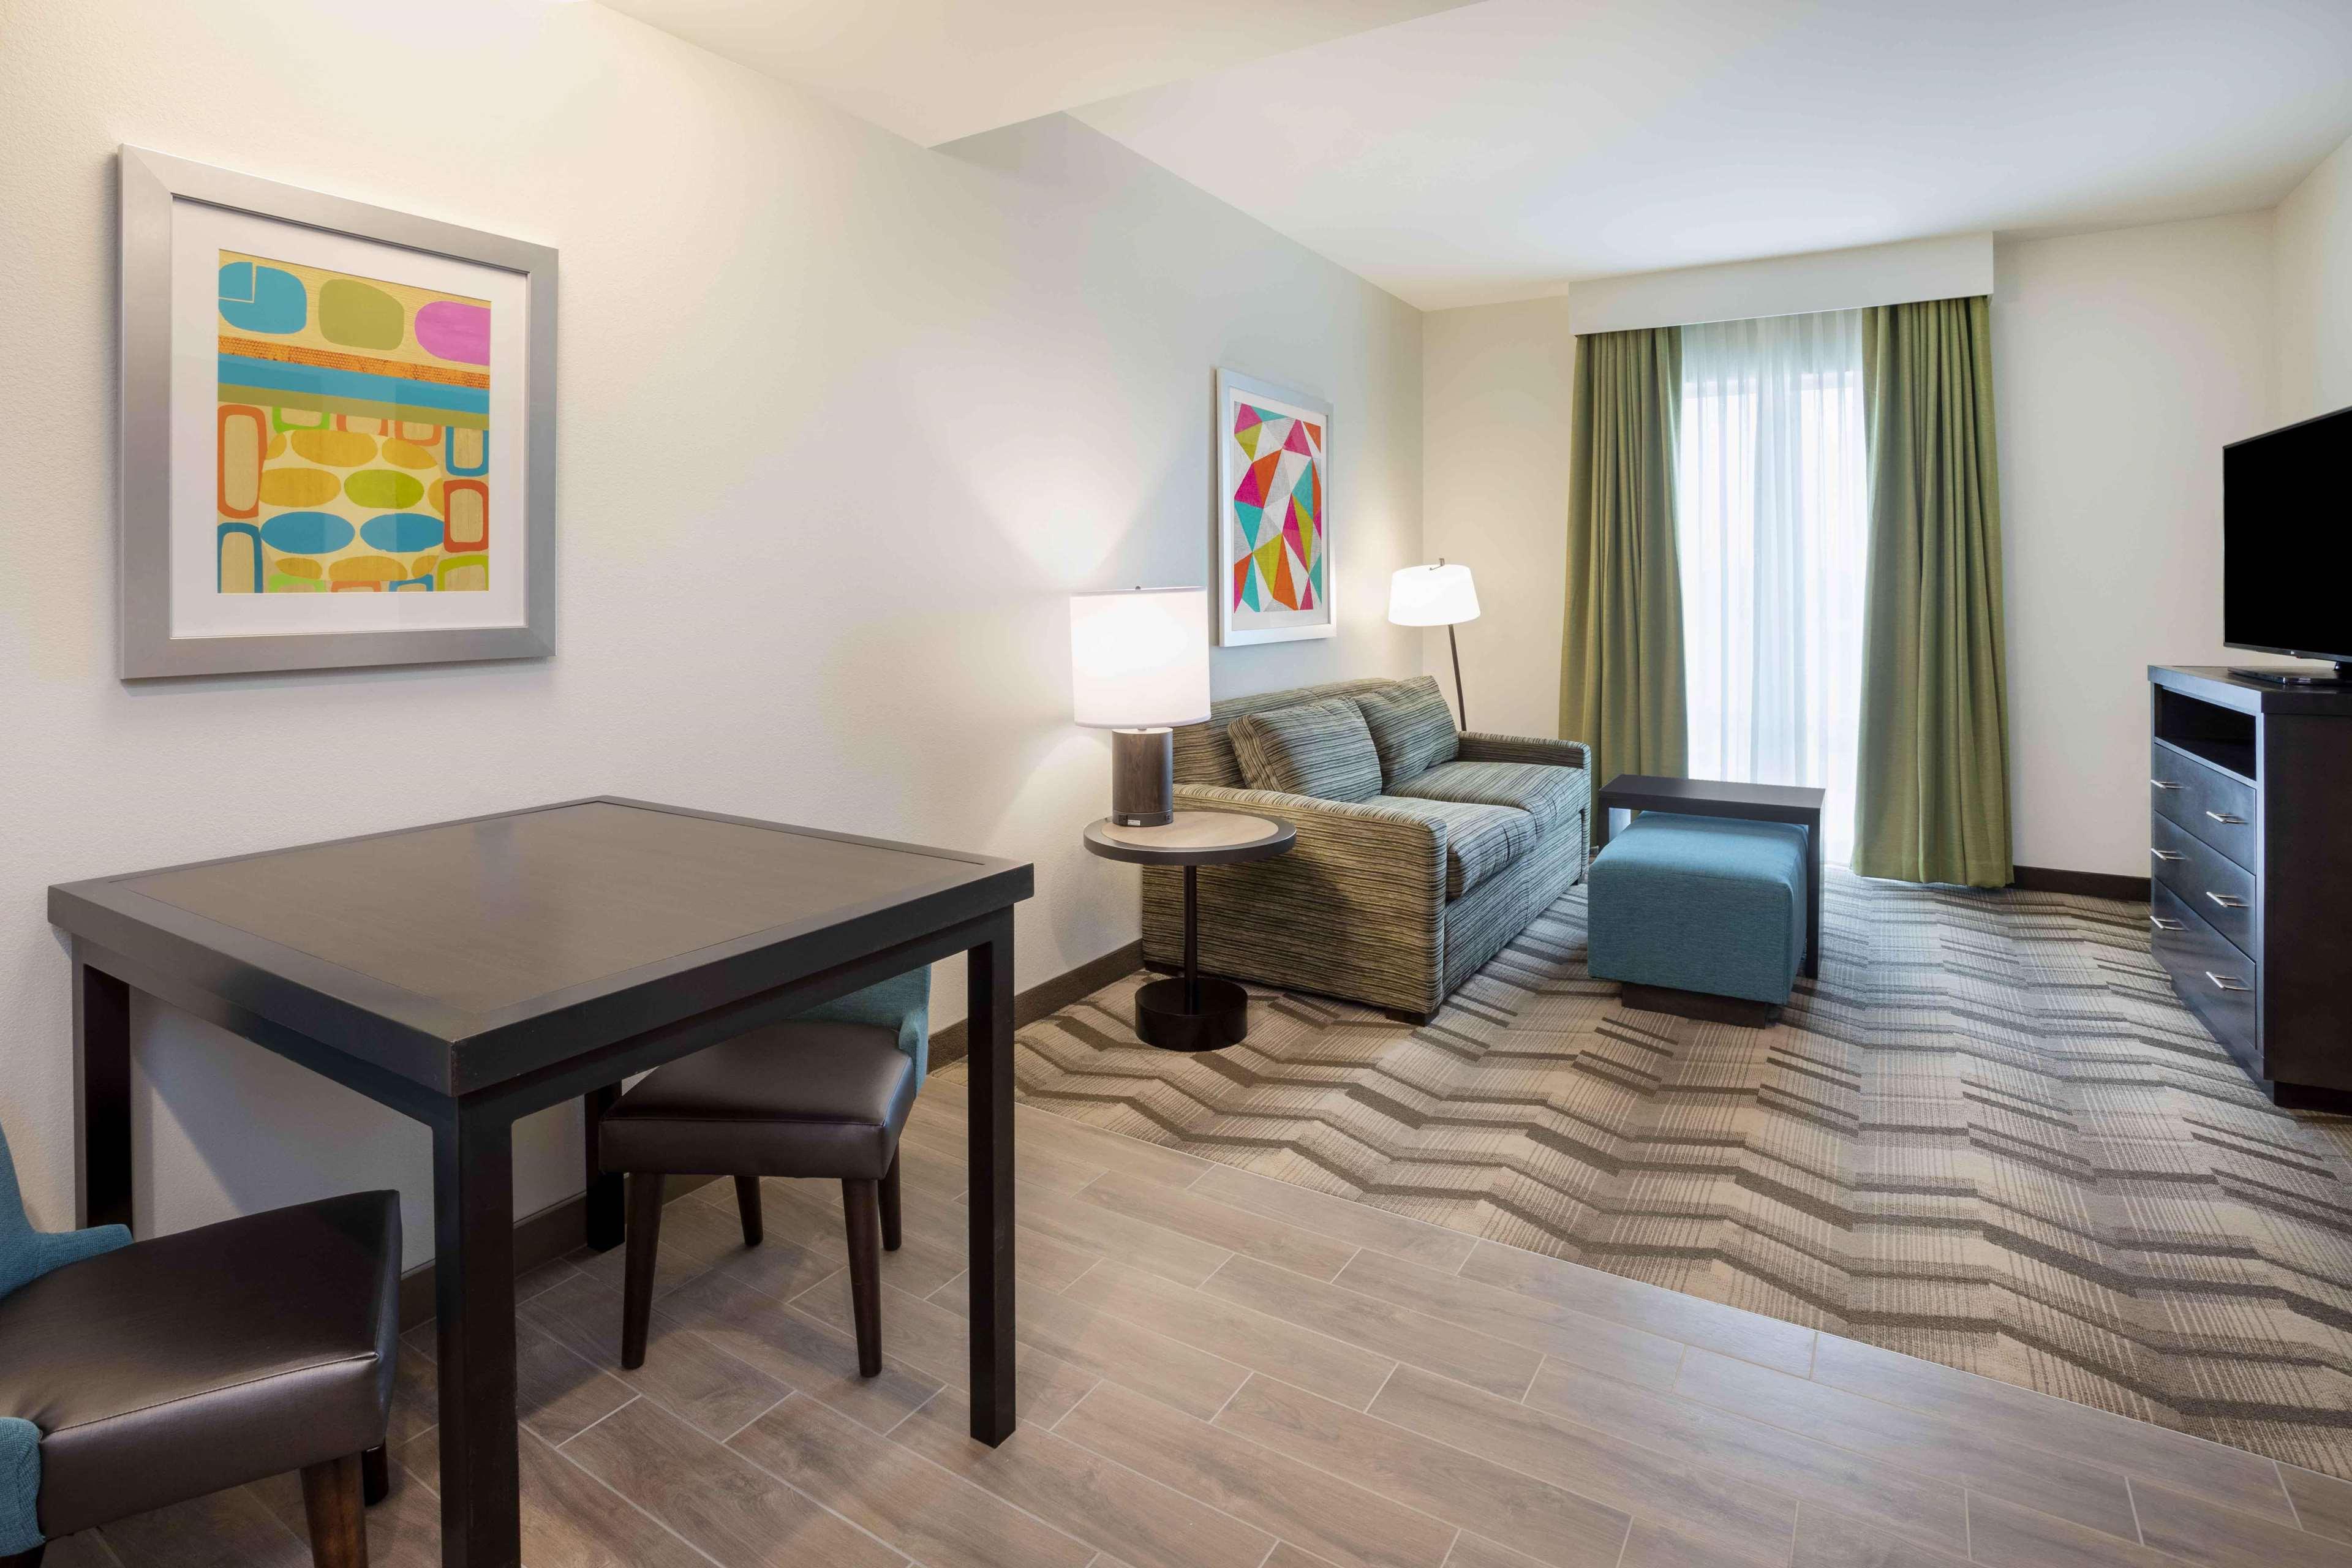 Homewood Suites by Hilton Edina Minneapolis image 26